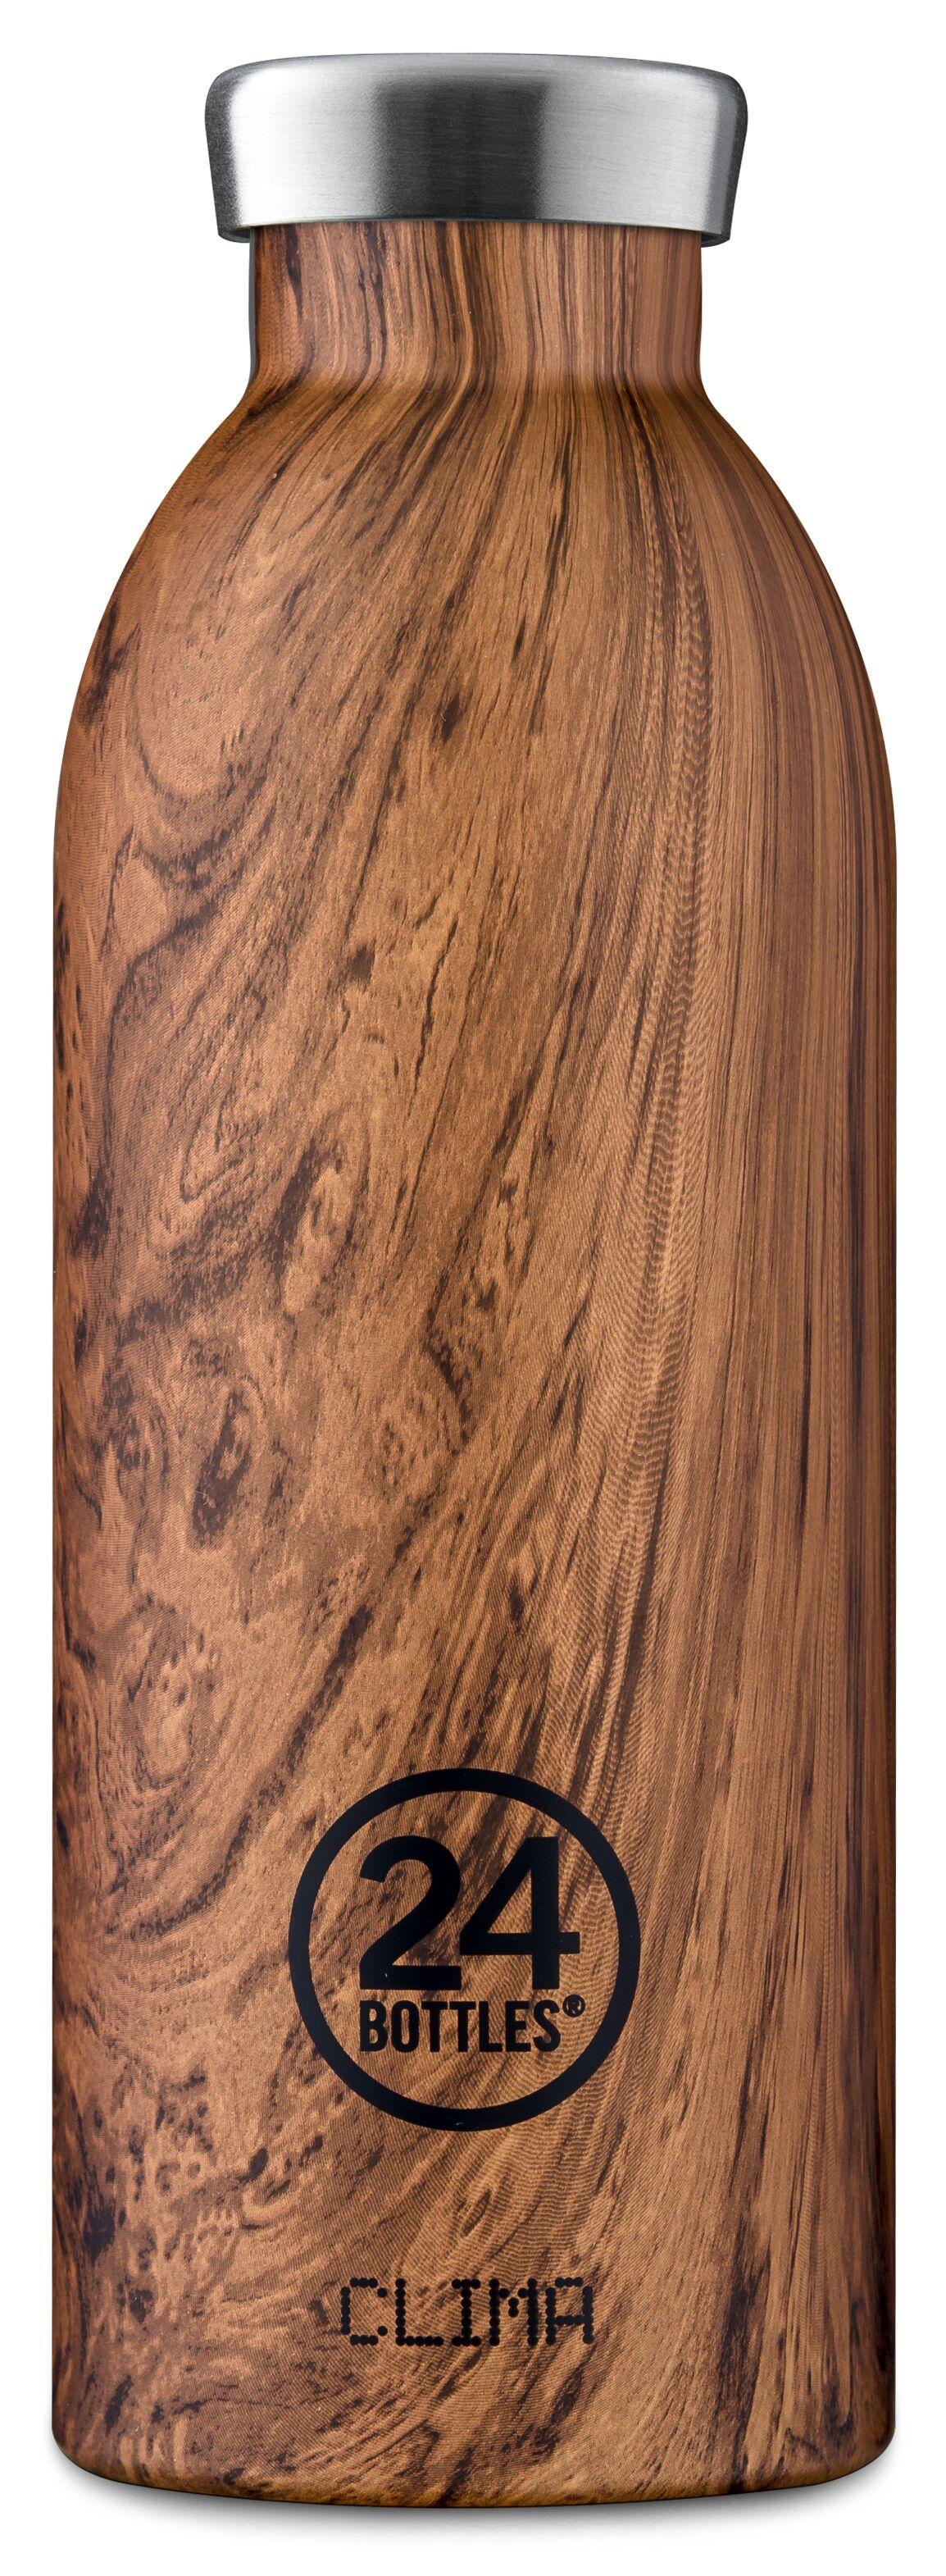 24 Bottles - Clima Bottle 0,5 L - Sequoia Wood Print (24B156)